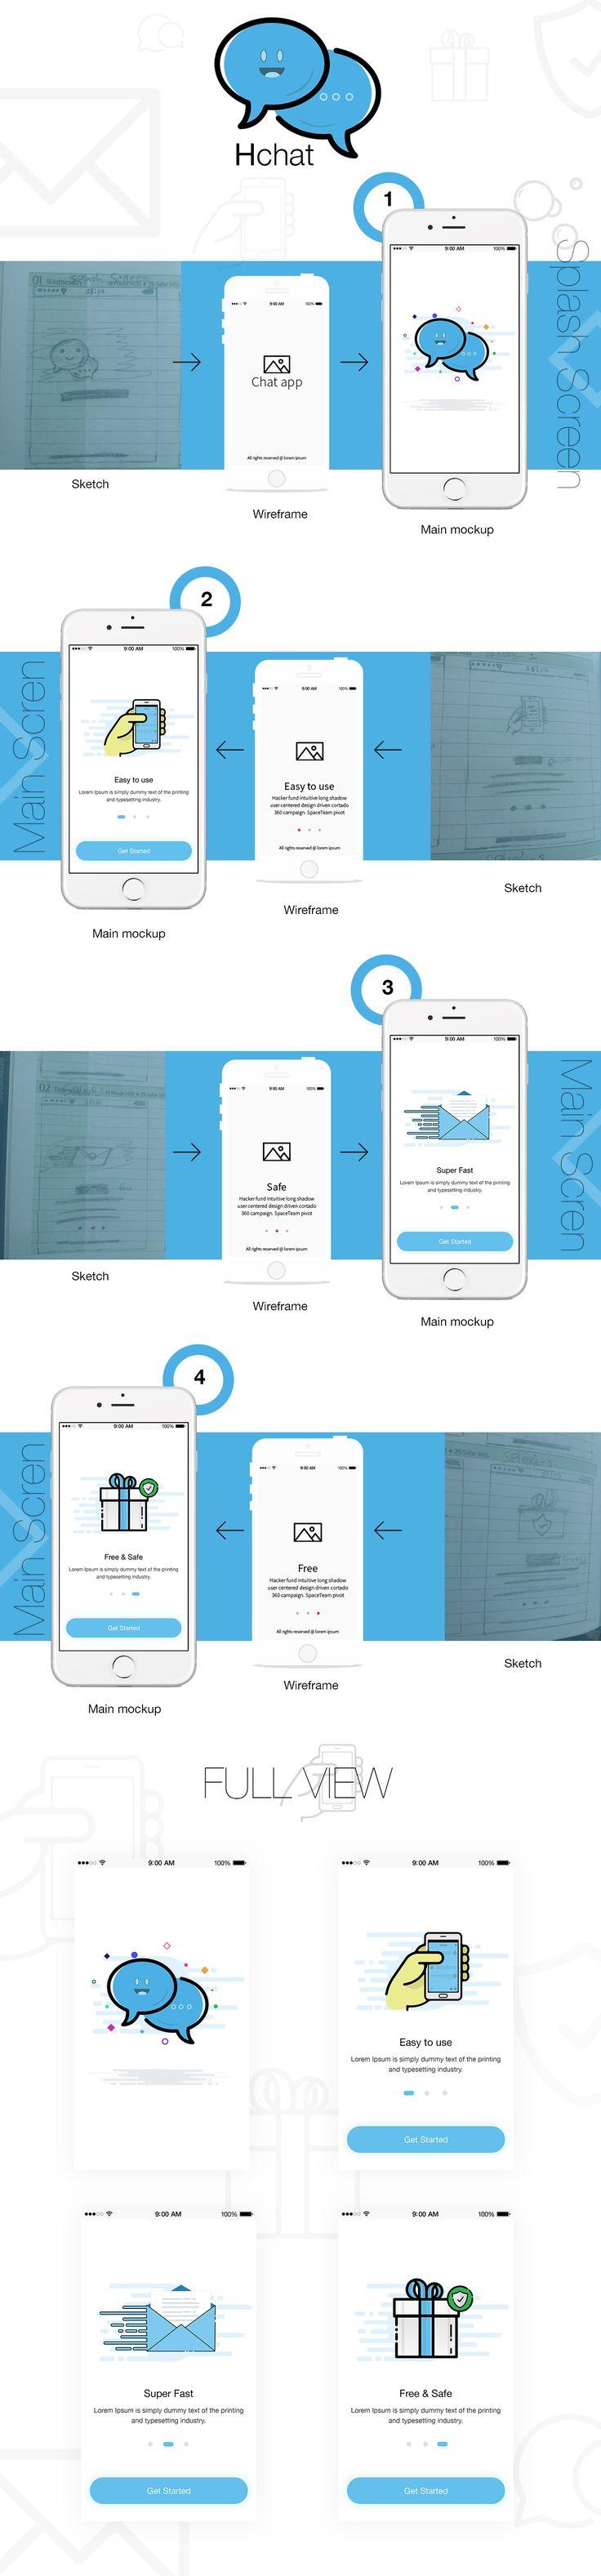 Messaging App ios design Concept on Behance